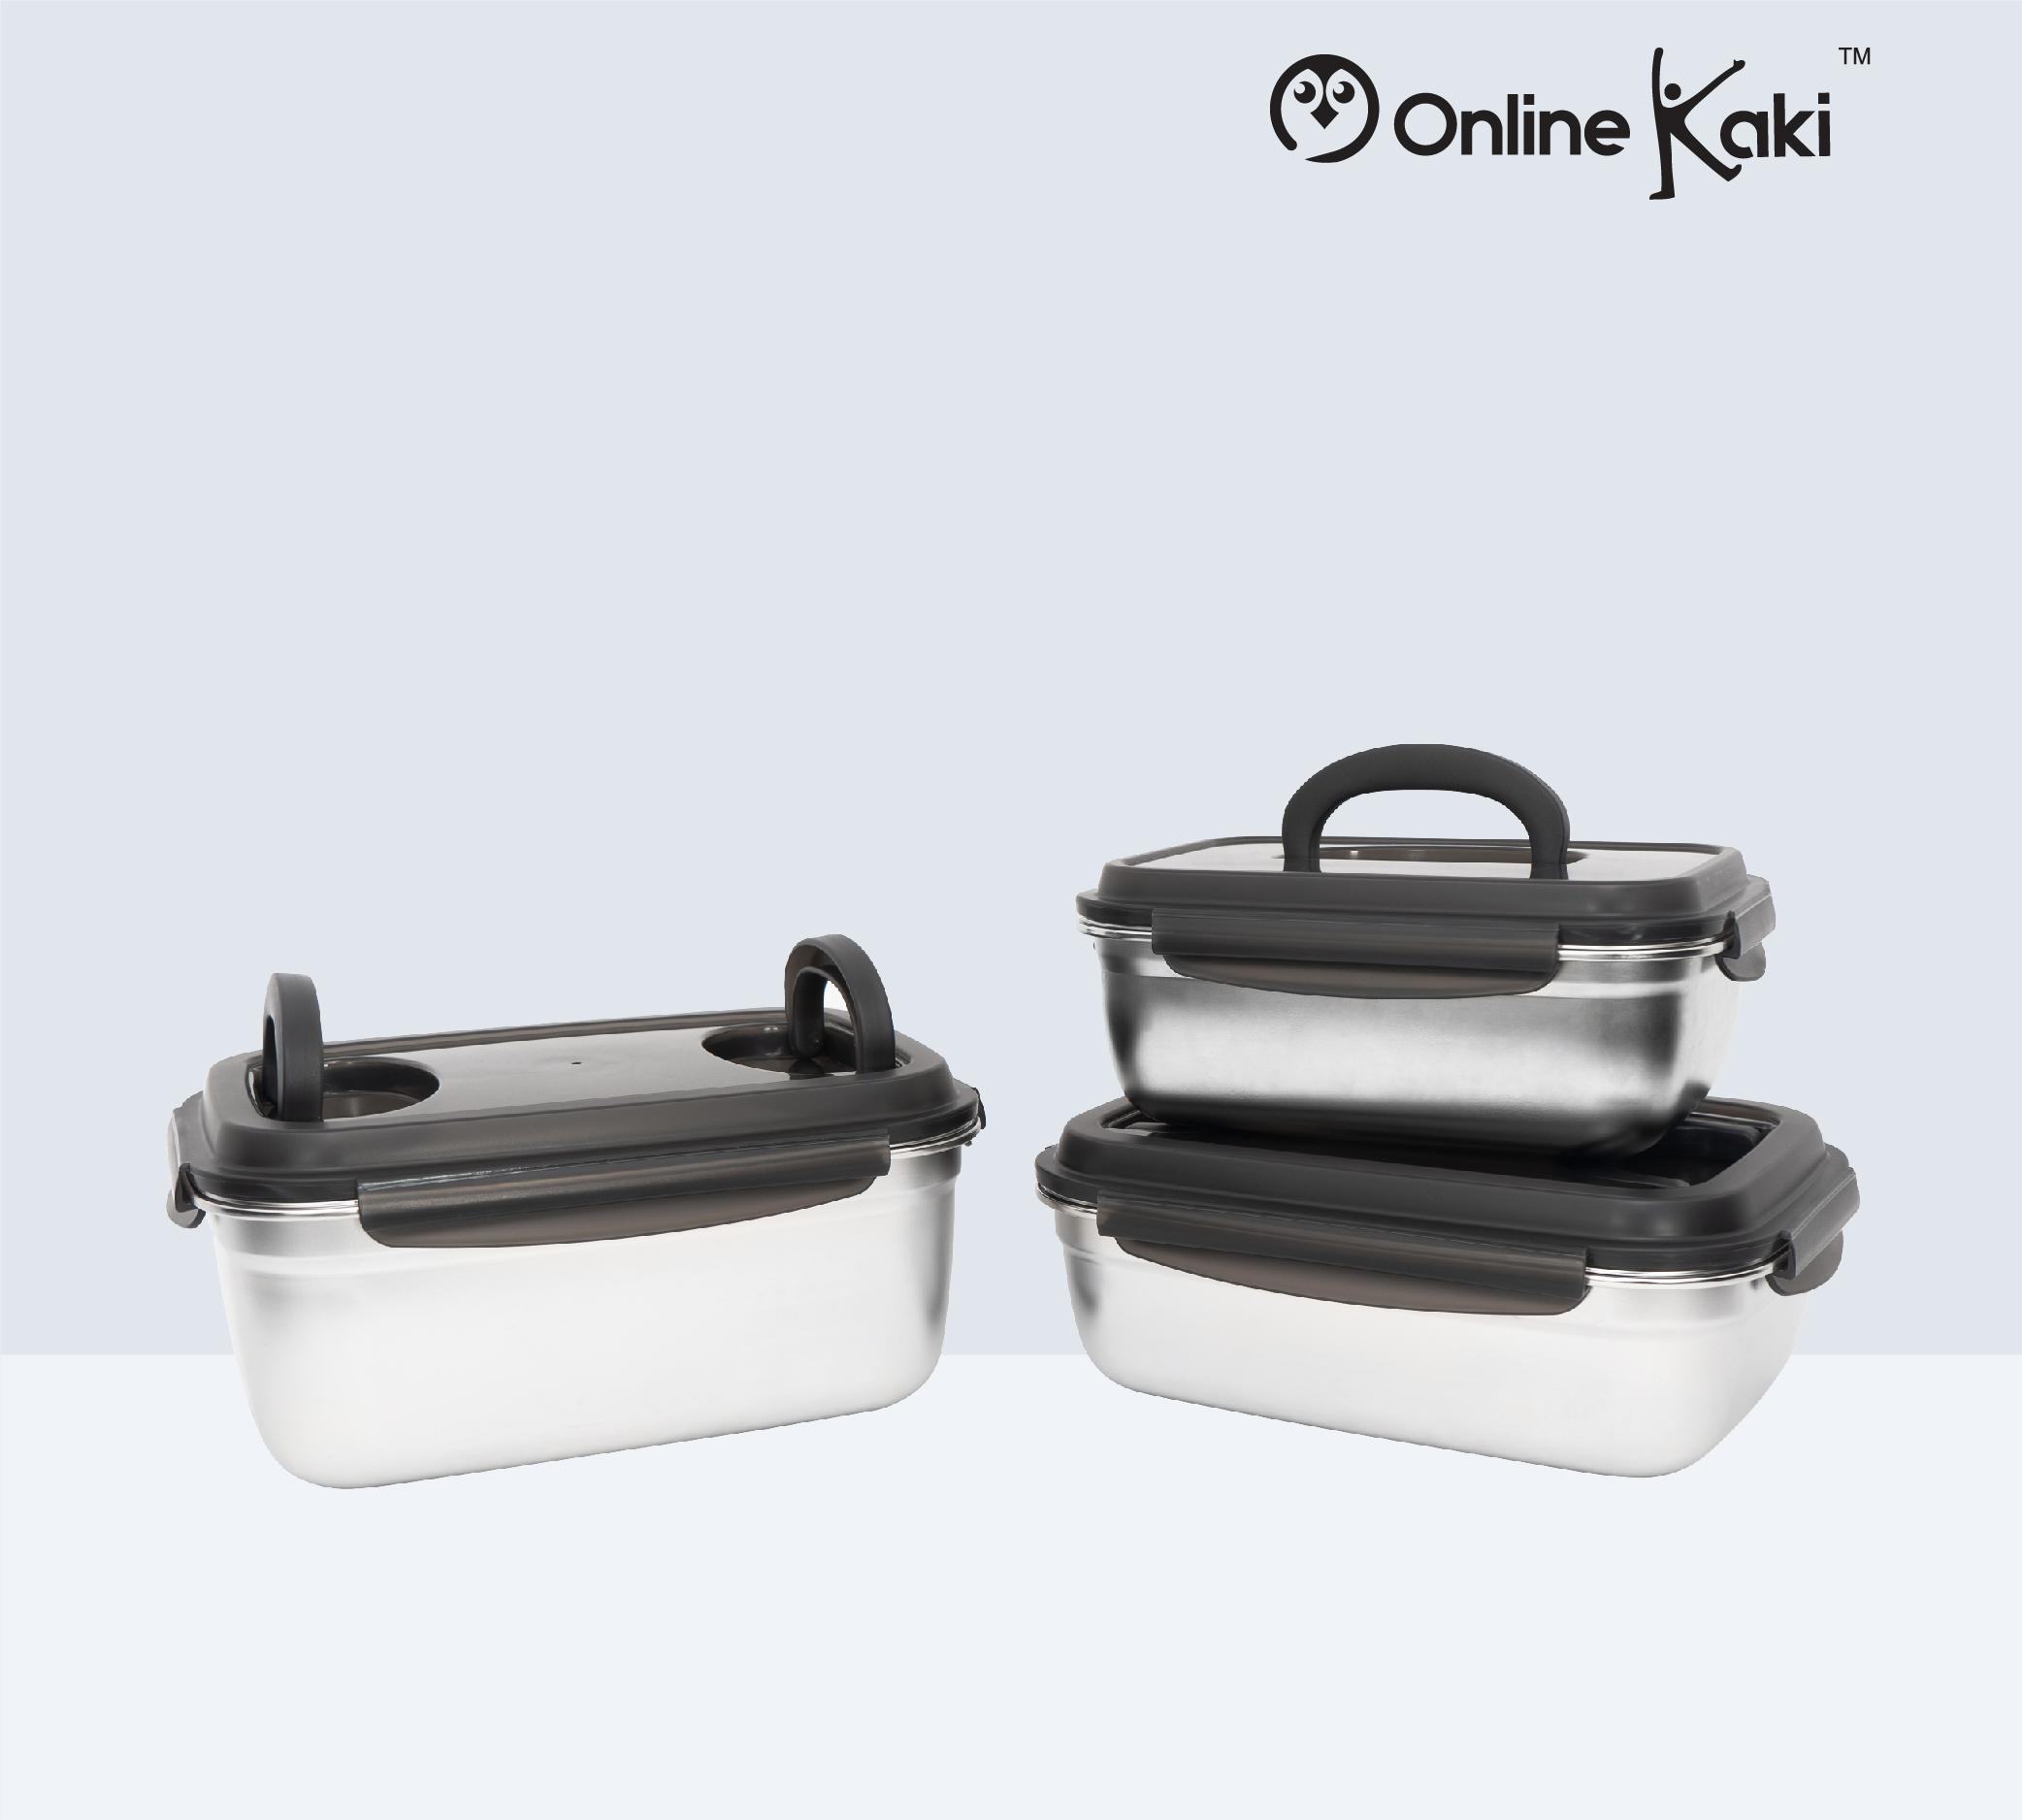 3.8L EXE-STAINLESS STEEL FOOD STORAGE 高级304砂钢料理盒 (FS2875)